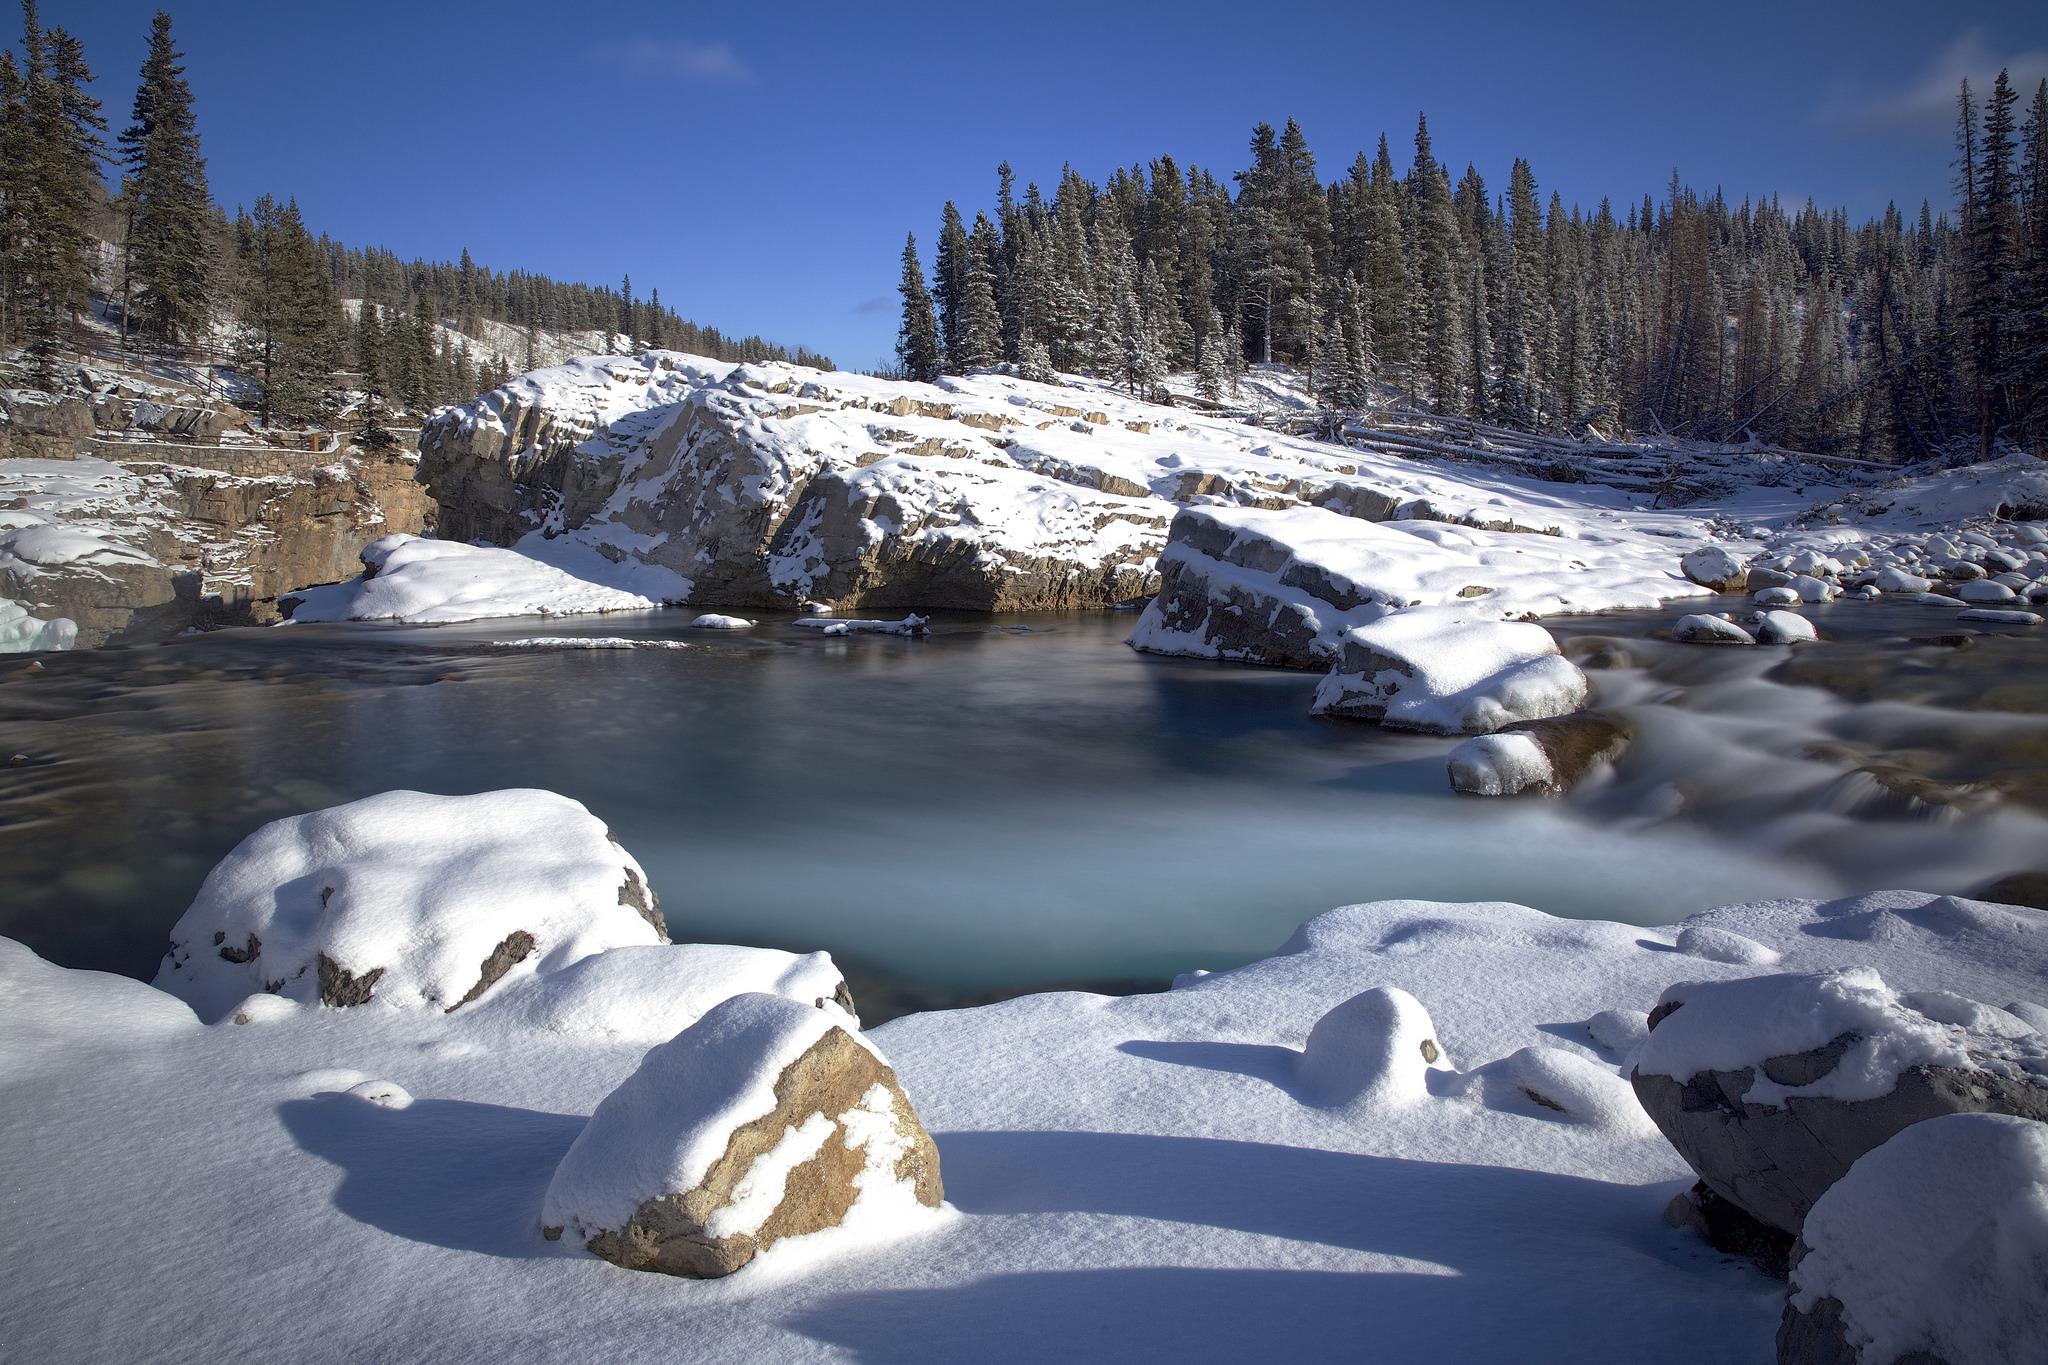 горы камни снег зима  № 2512901 без смс